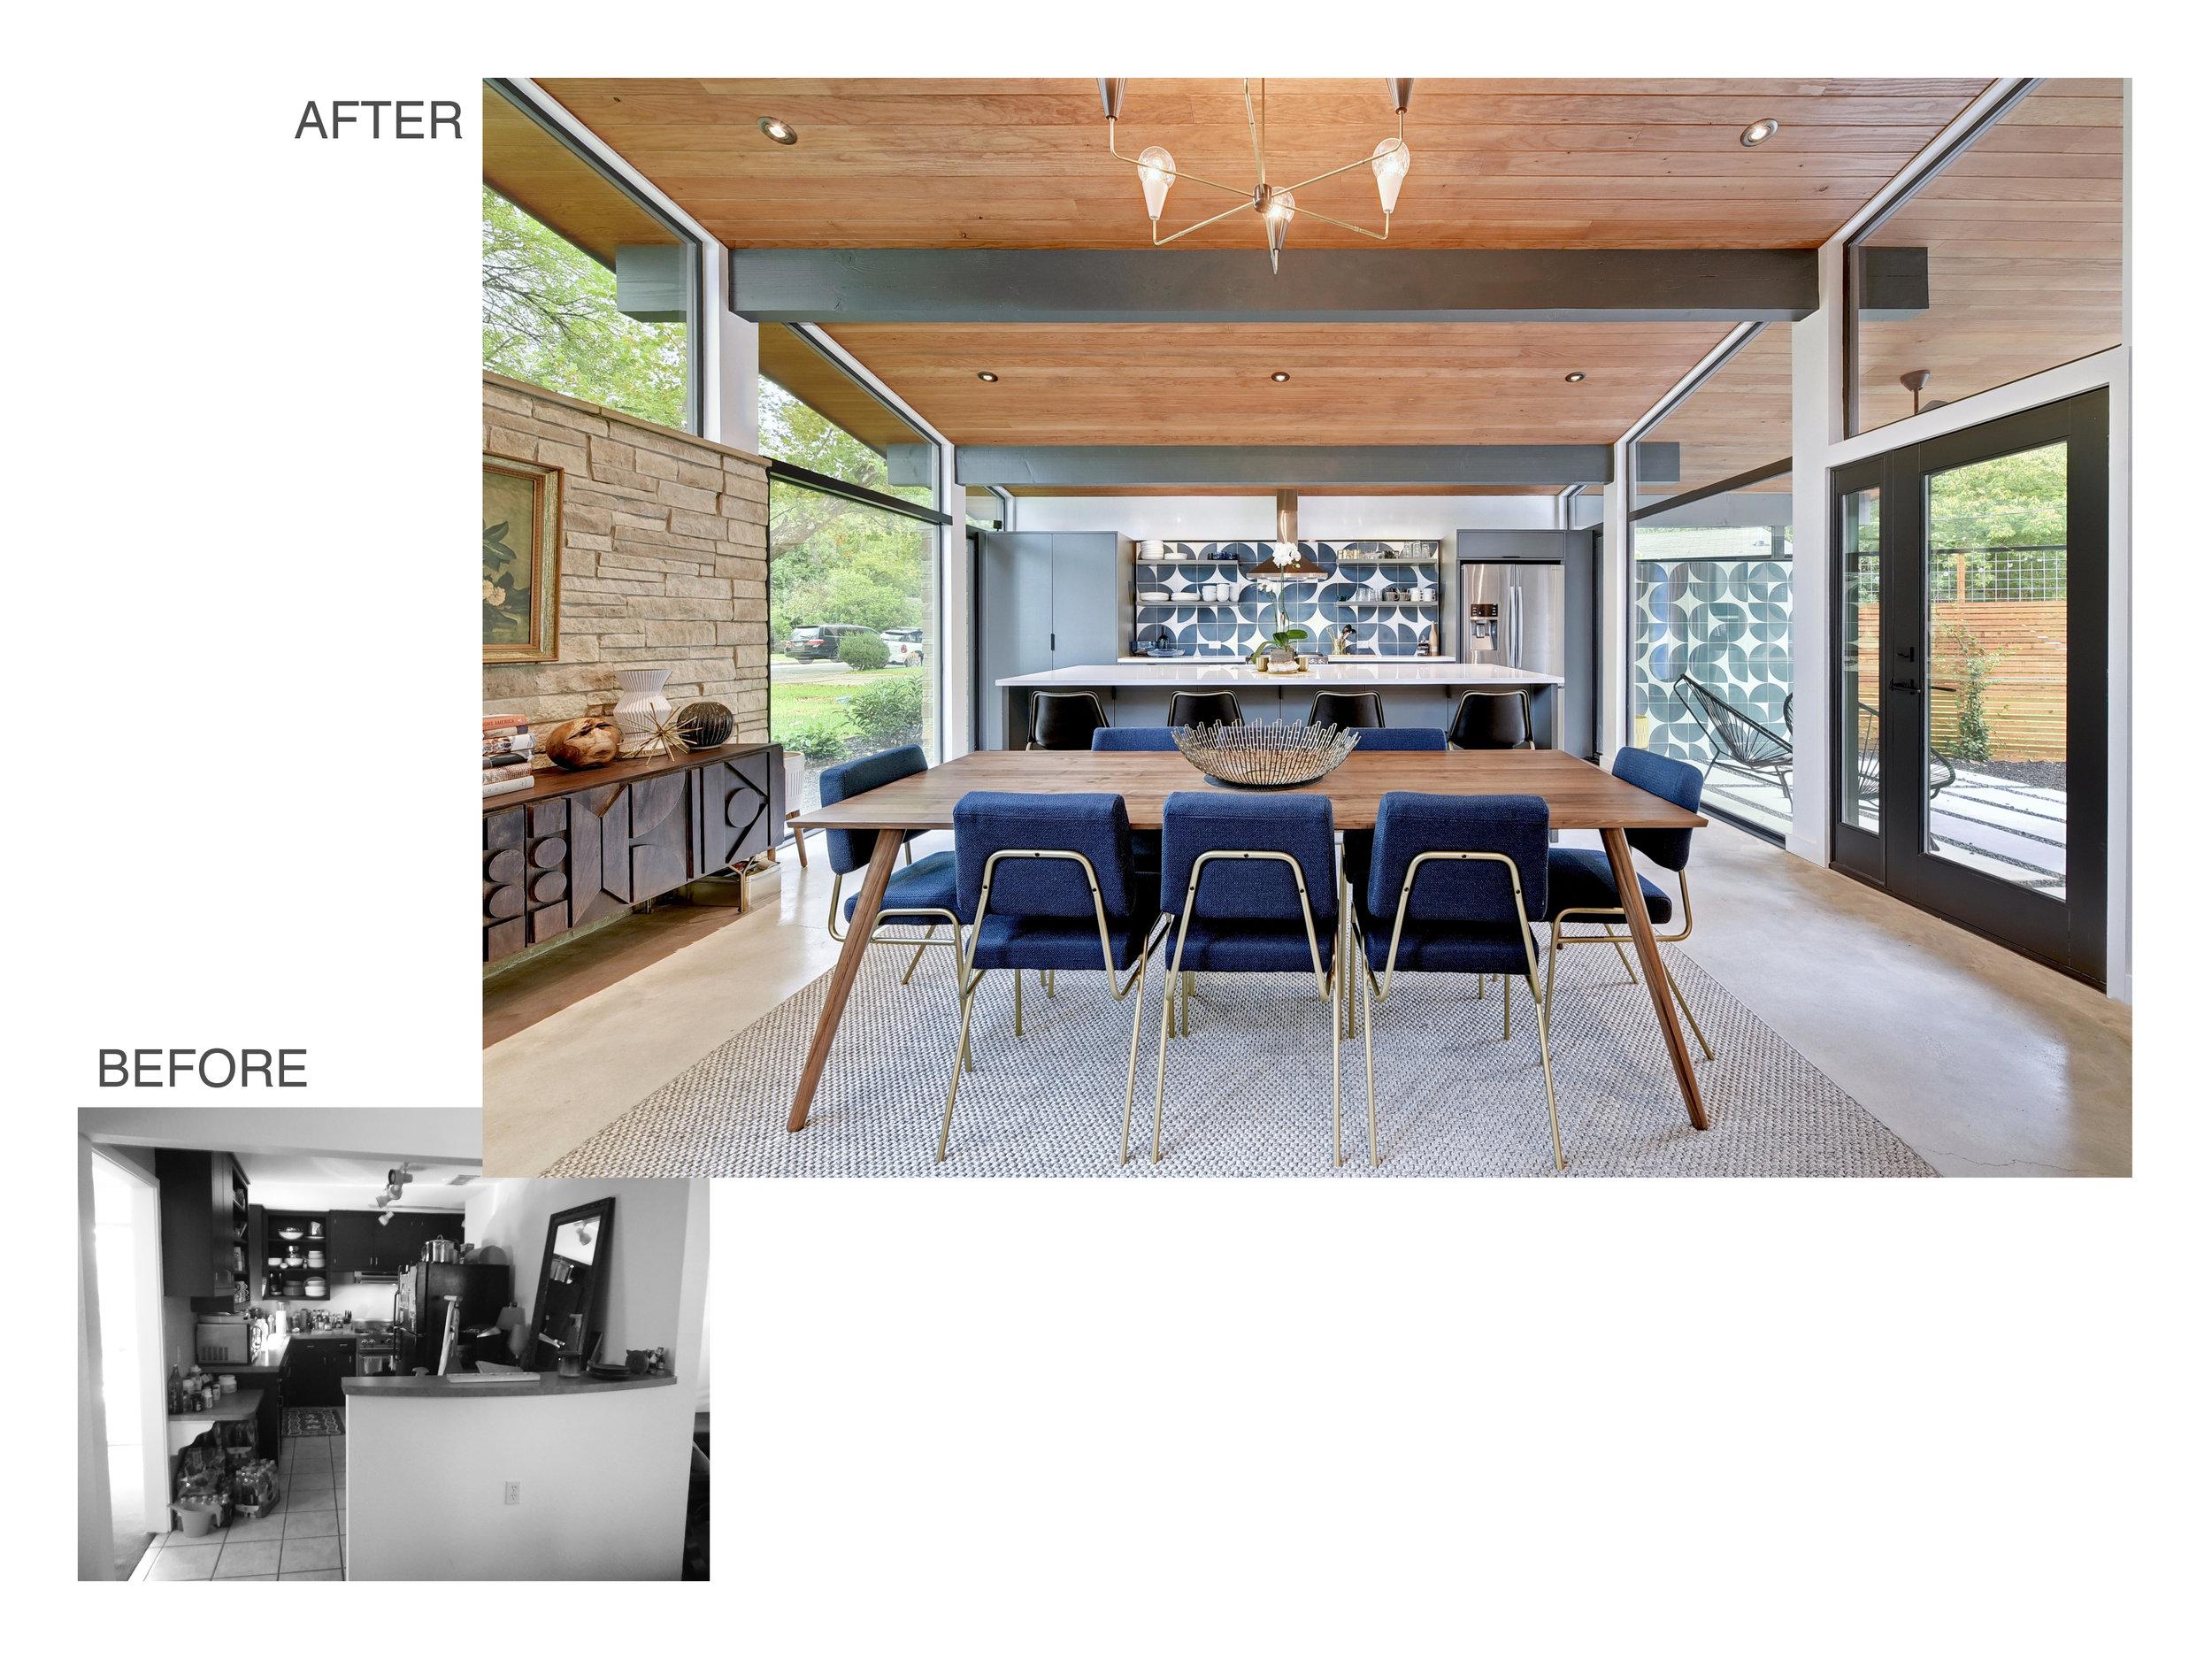 Re-Open House by Matt Fajkus Architecture - before & after 1.jpg